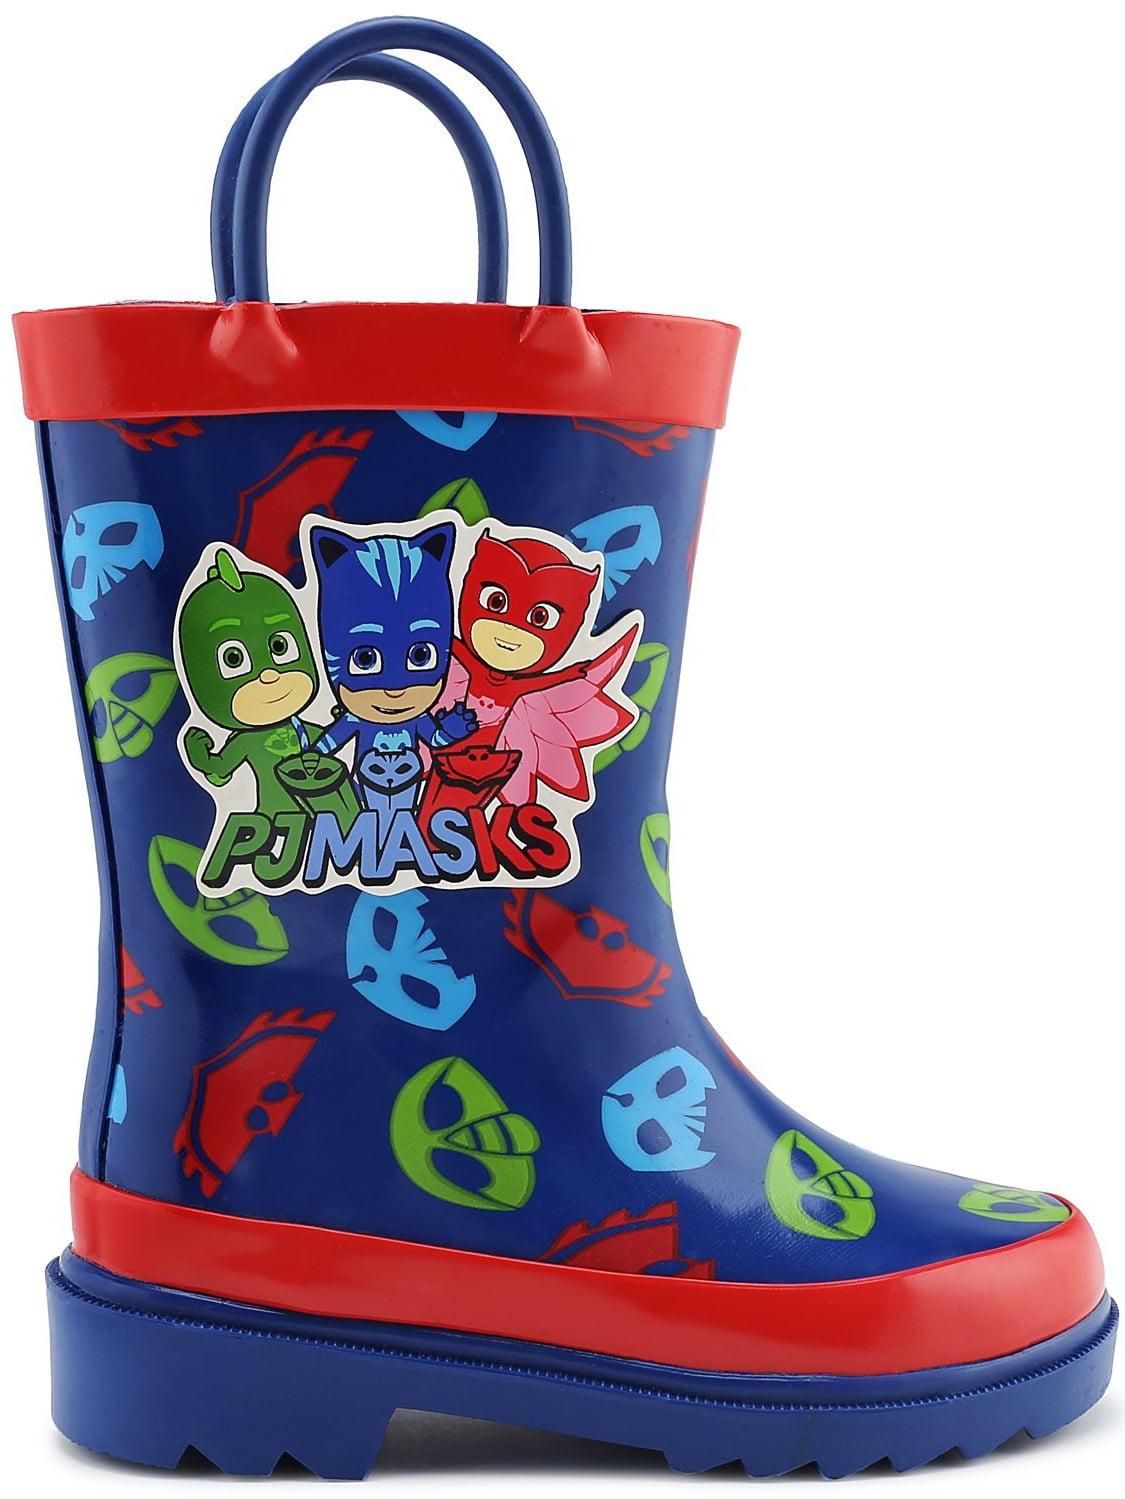 PJ Masks Little Boys Character Printed Waterproof Easy-On Rubber Rain Boots Toddler//Little Kids